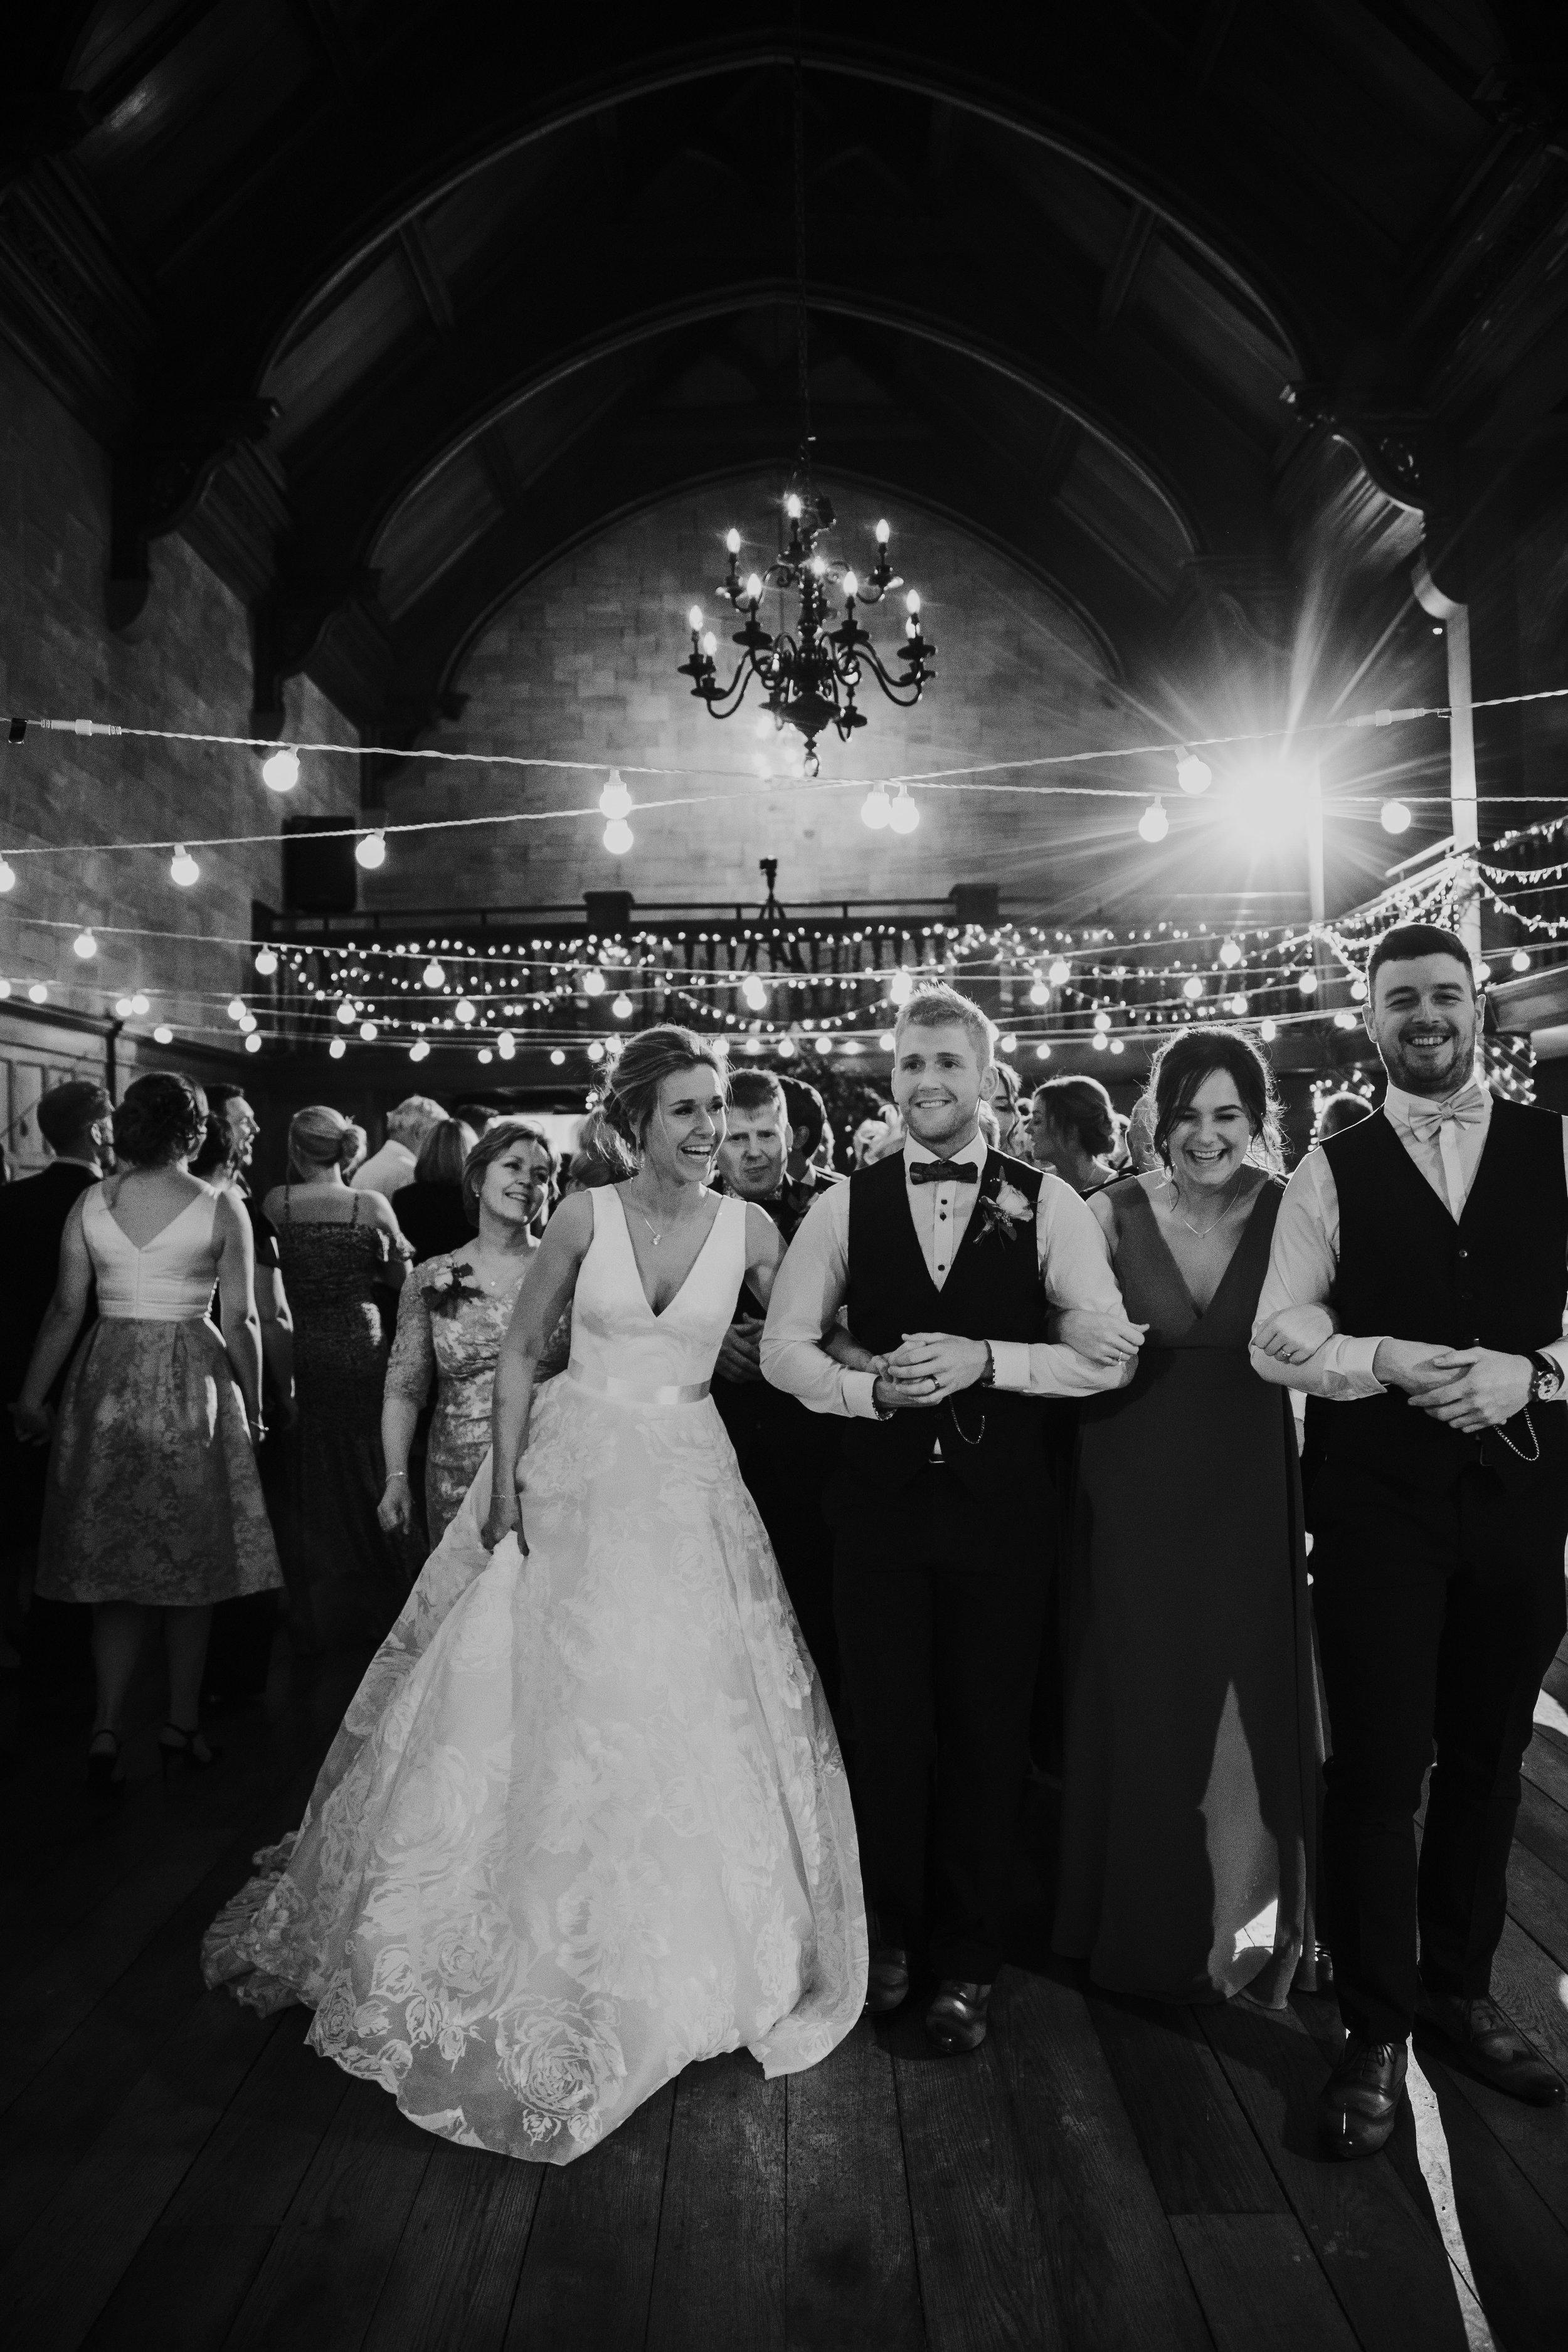 Karin_and_Shauns_Wedding_-_Achnagairn_Castle_-_www.eilidhrobertson.co.uk-1306.jpg